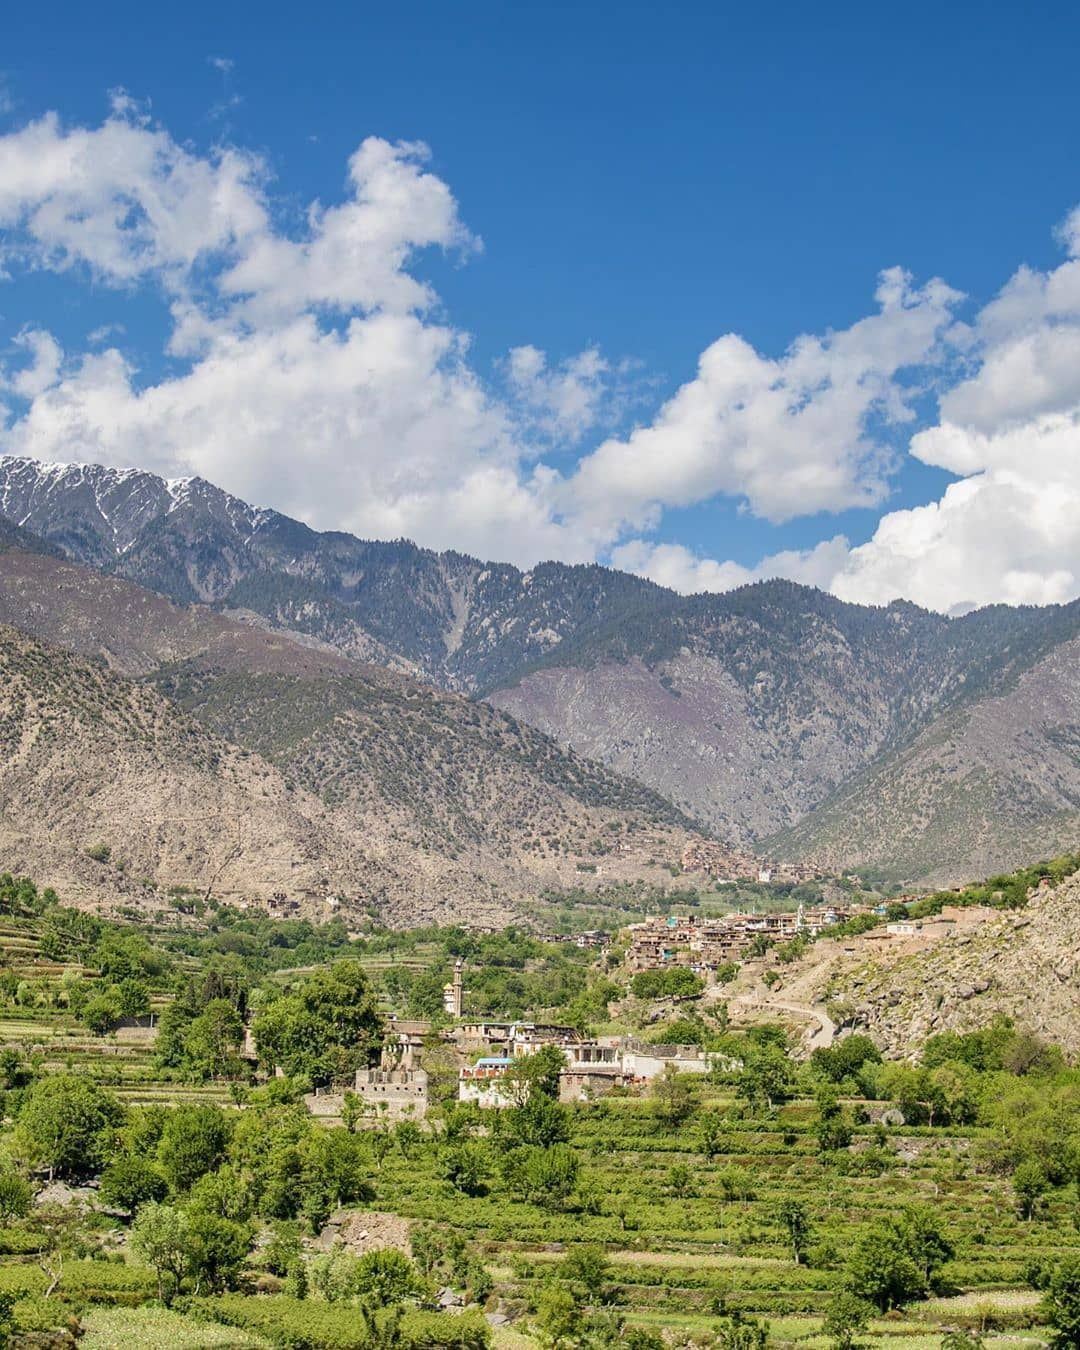 ᴀғɢʜᴀɴɪsᴛᴀɴ Auf Instagram ولایت زیبای ننگرهار Beautifulafghanistan افغانستان زیبا Afghanistan Everydayafghanista In 2020 Afghanistan Natural Landmarks Instagram